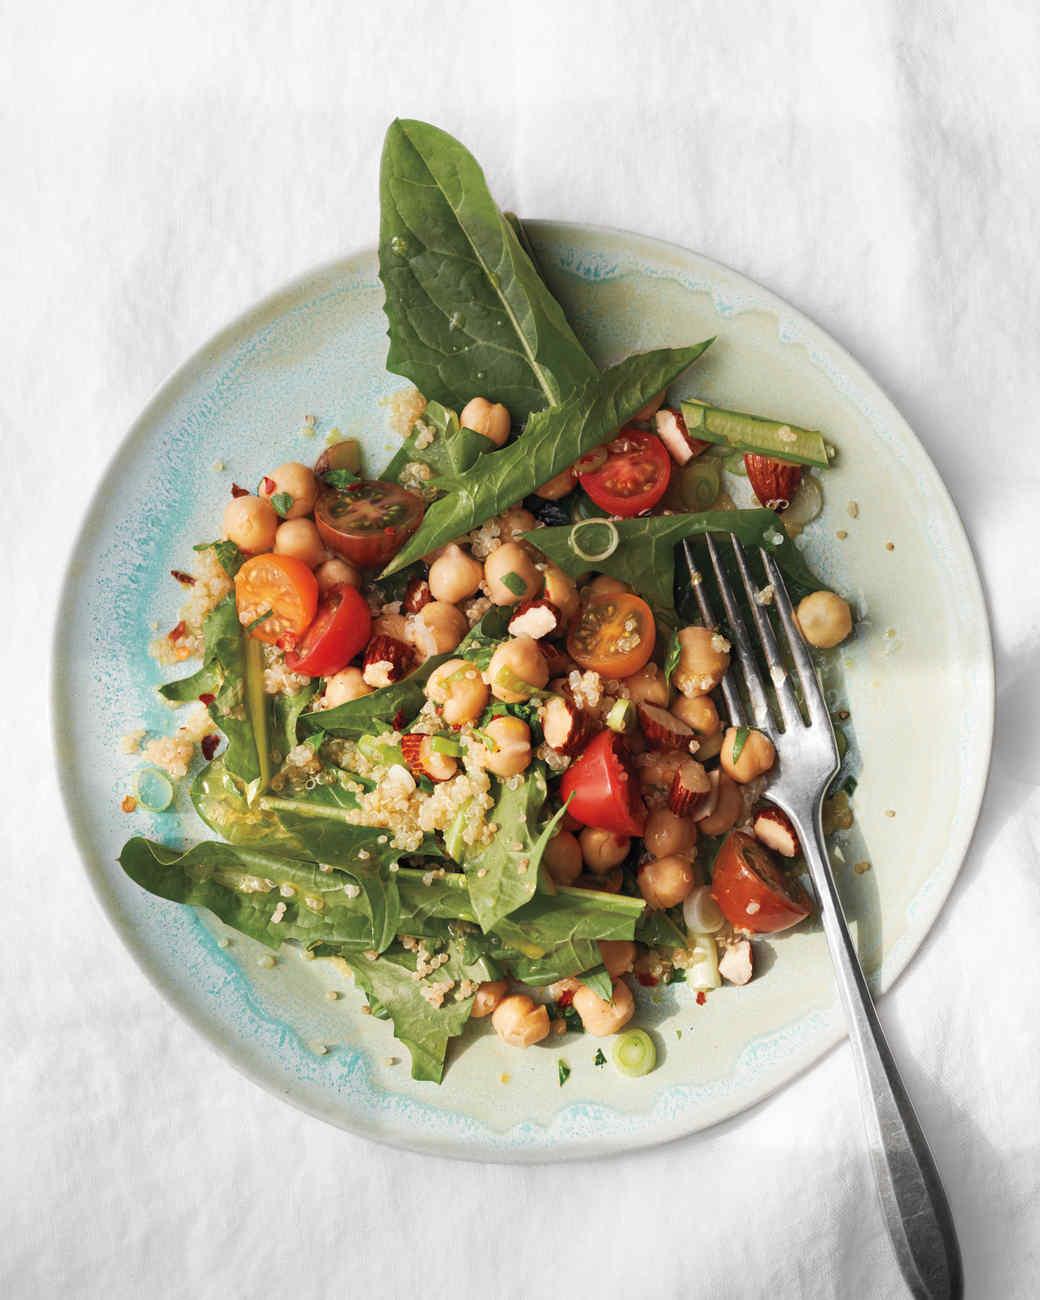 chickpea-salad-228-exp-1-d111129.jpg